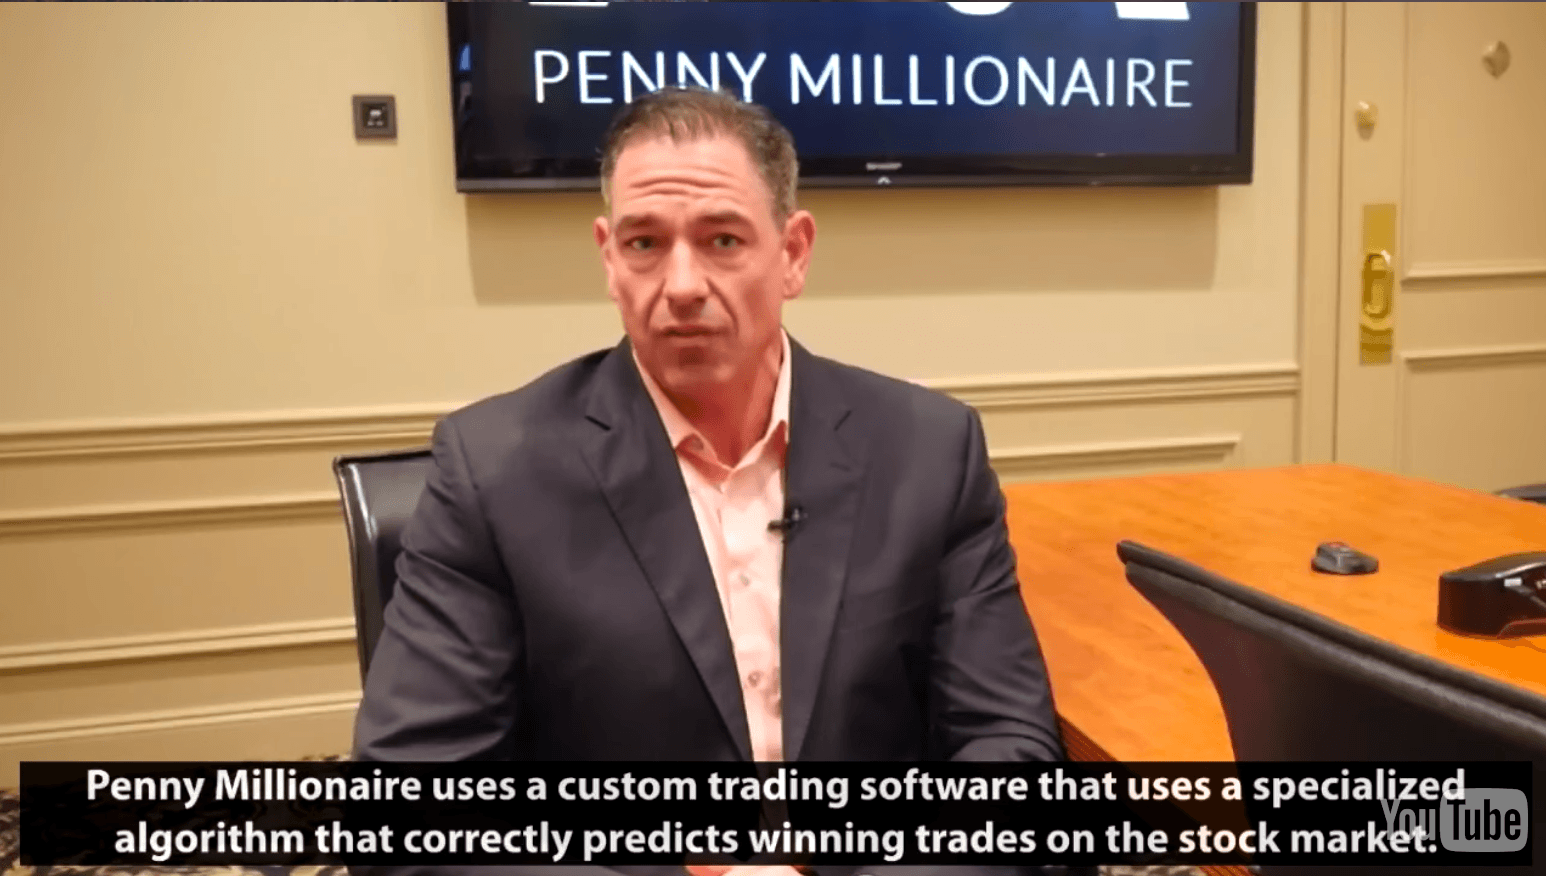 Penny-Millionaire-fondatore